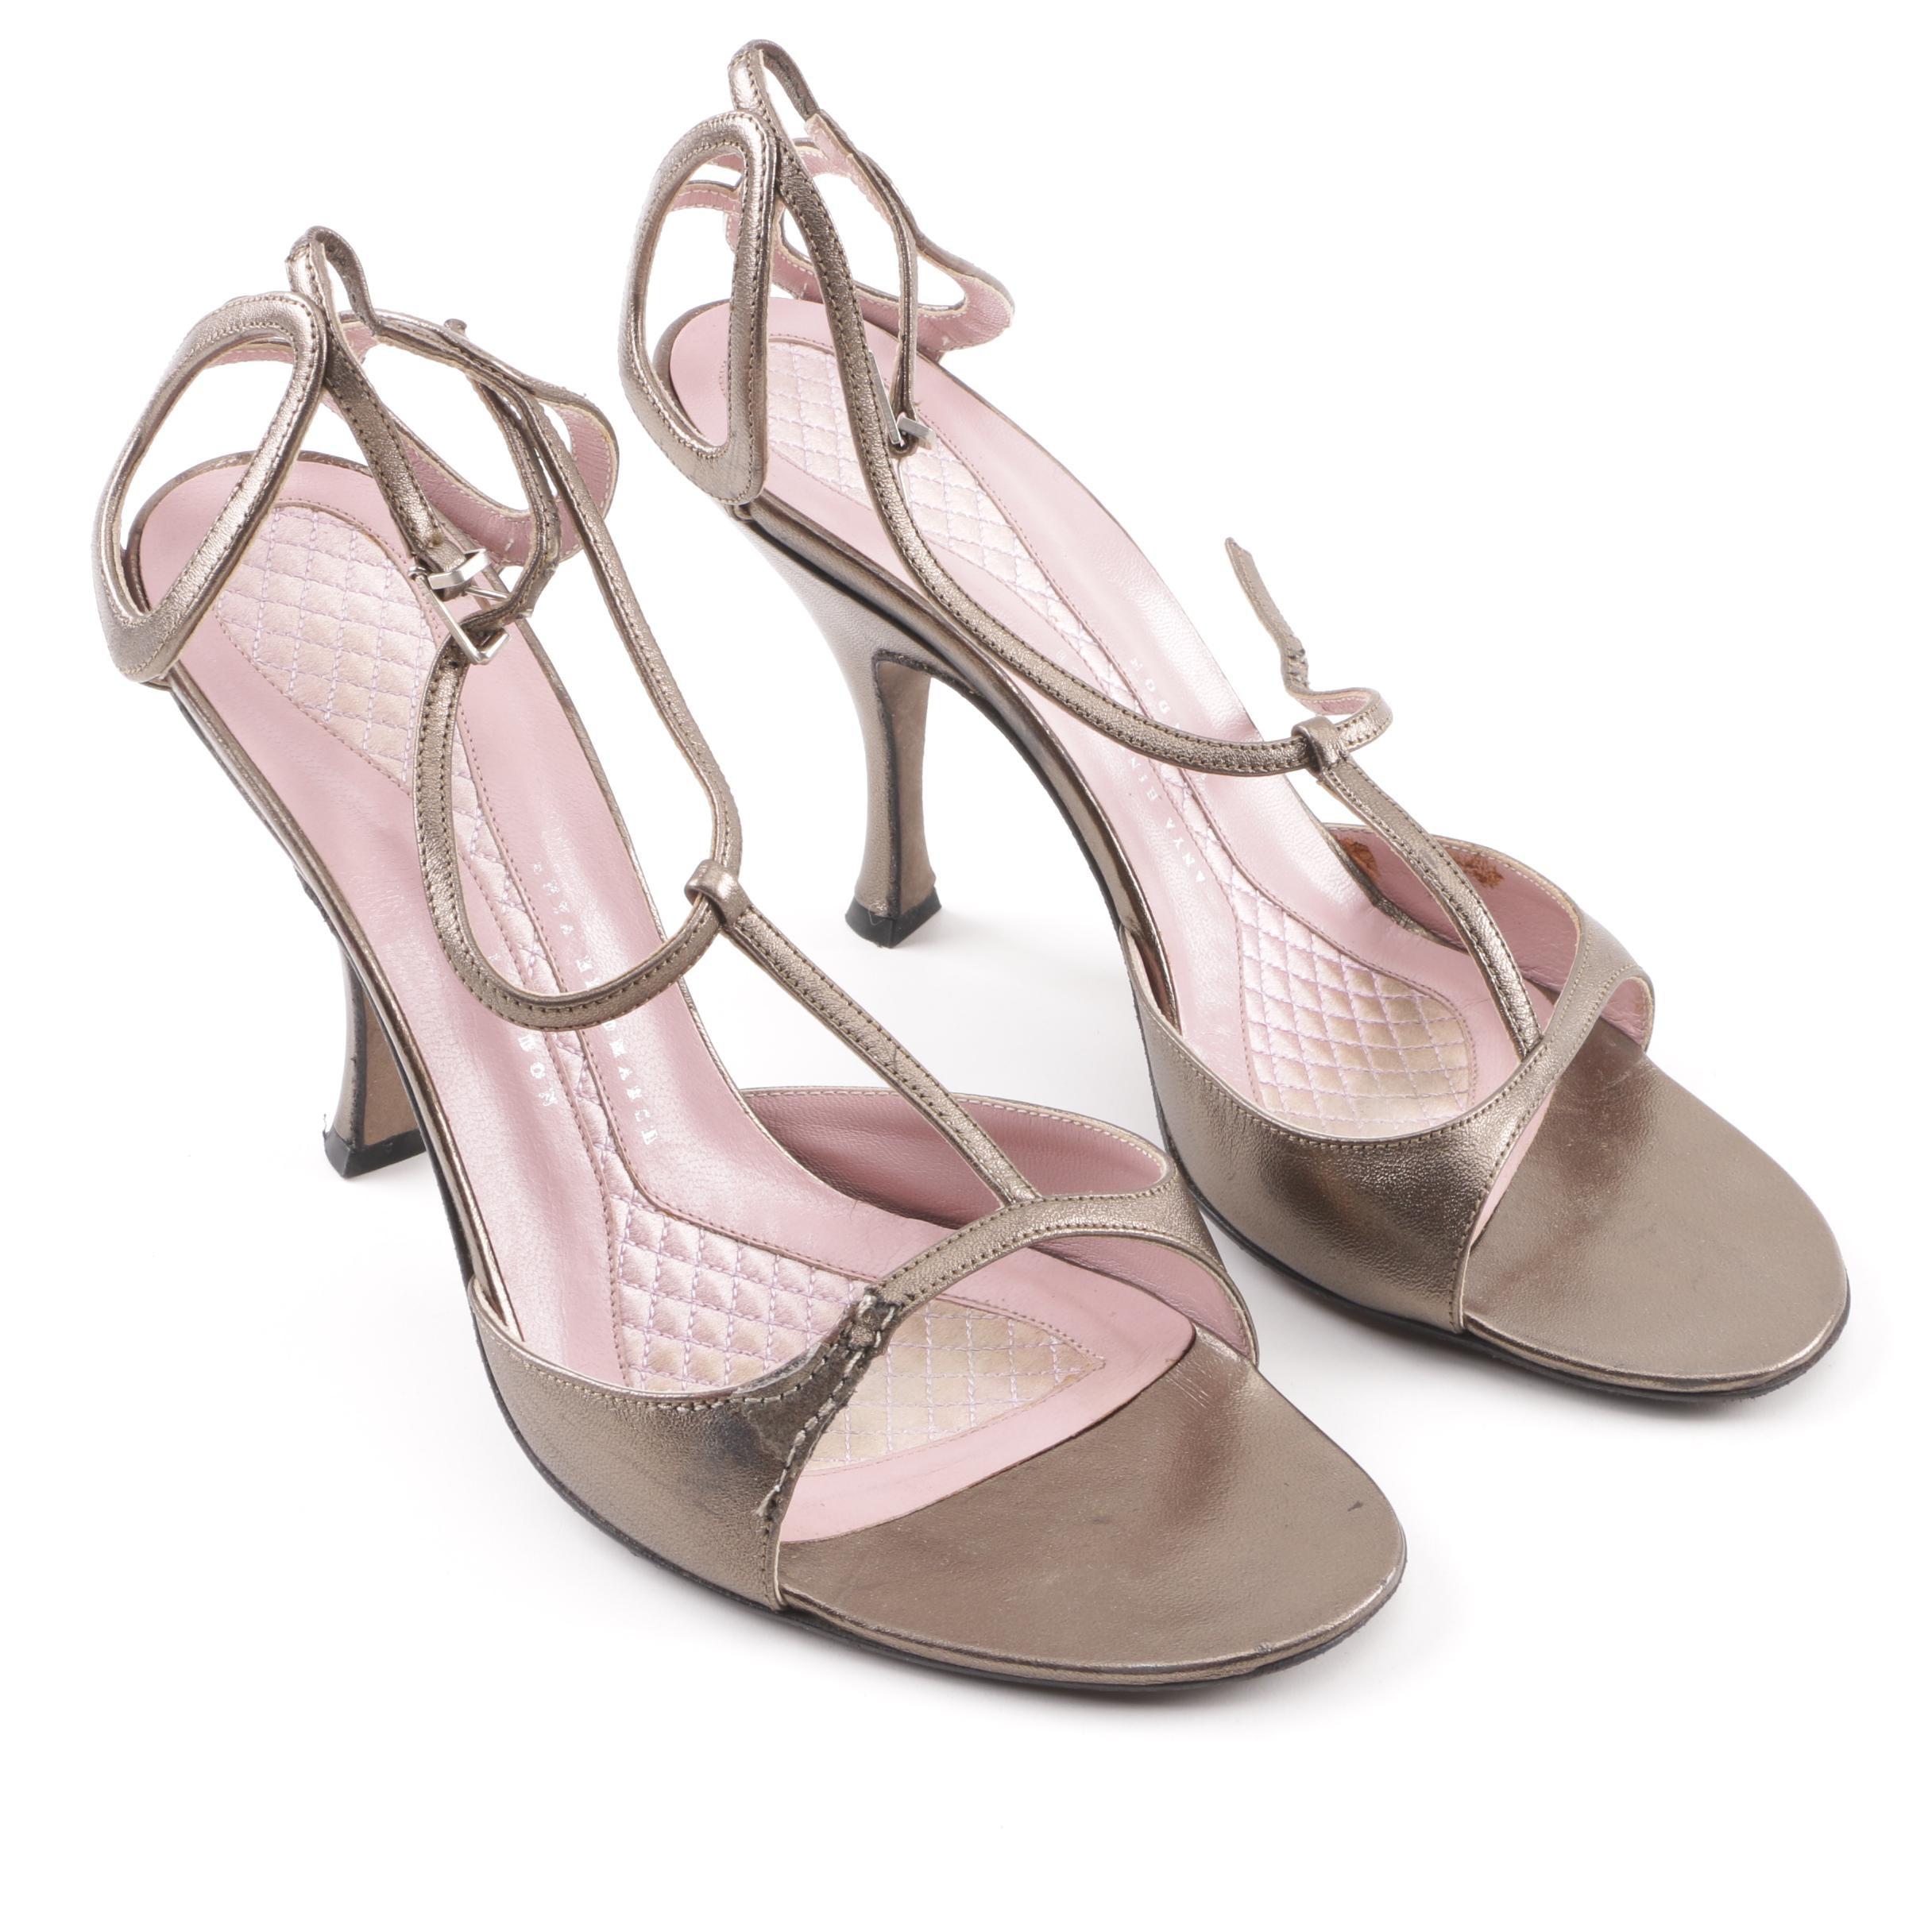 Anya Hindmarch Metallic Leather High-Heeled Sandals